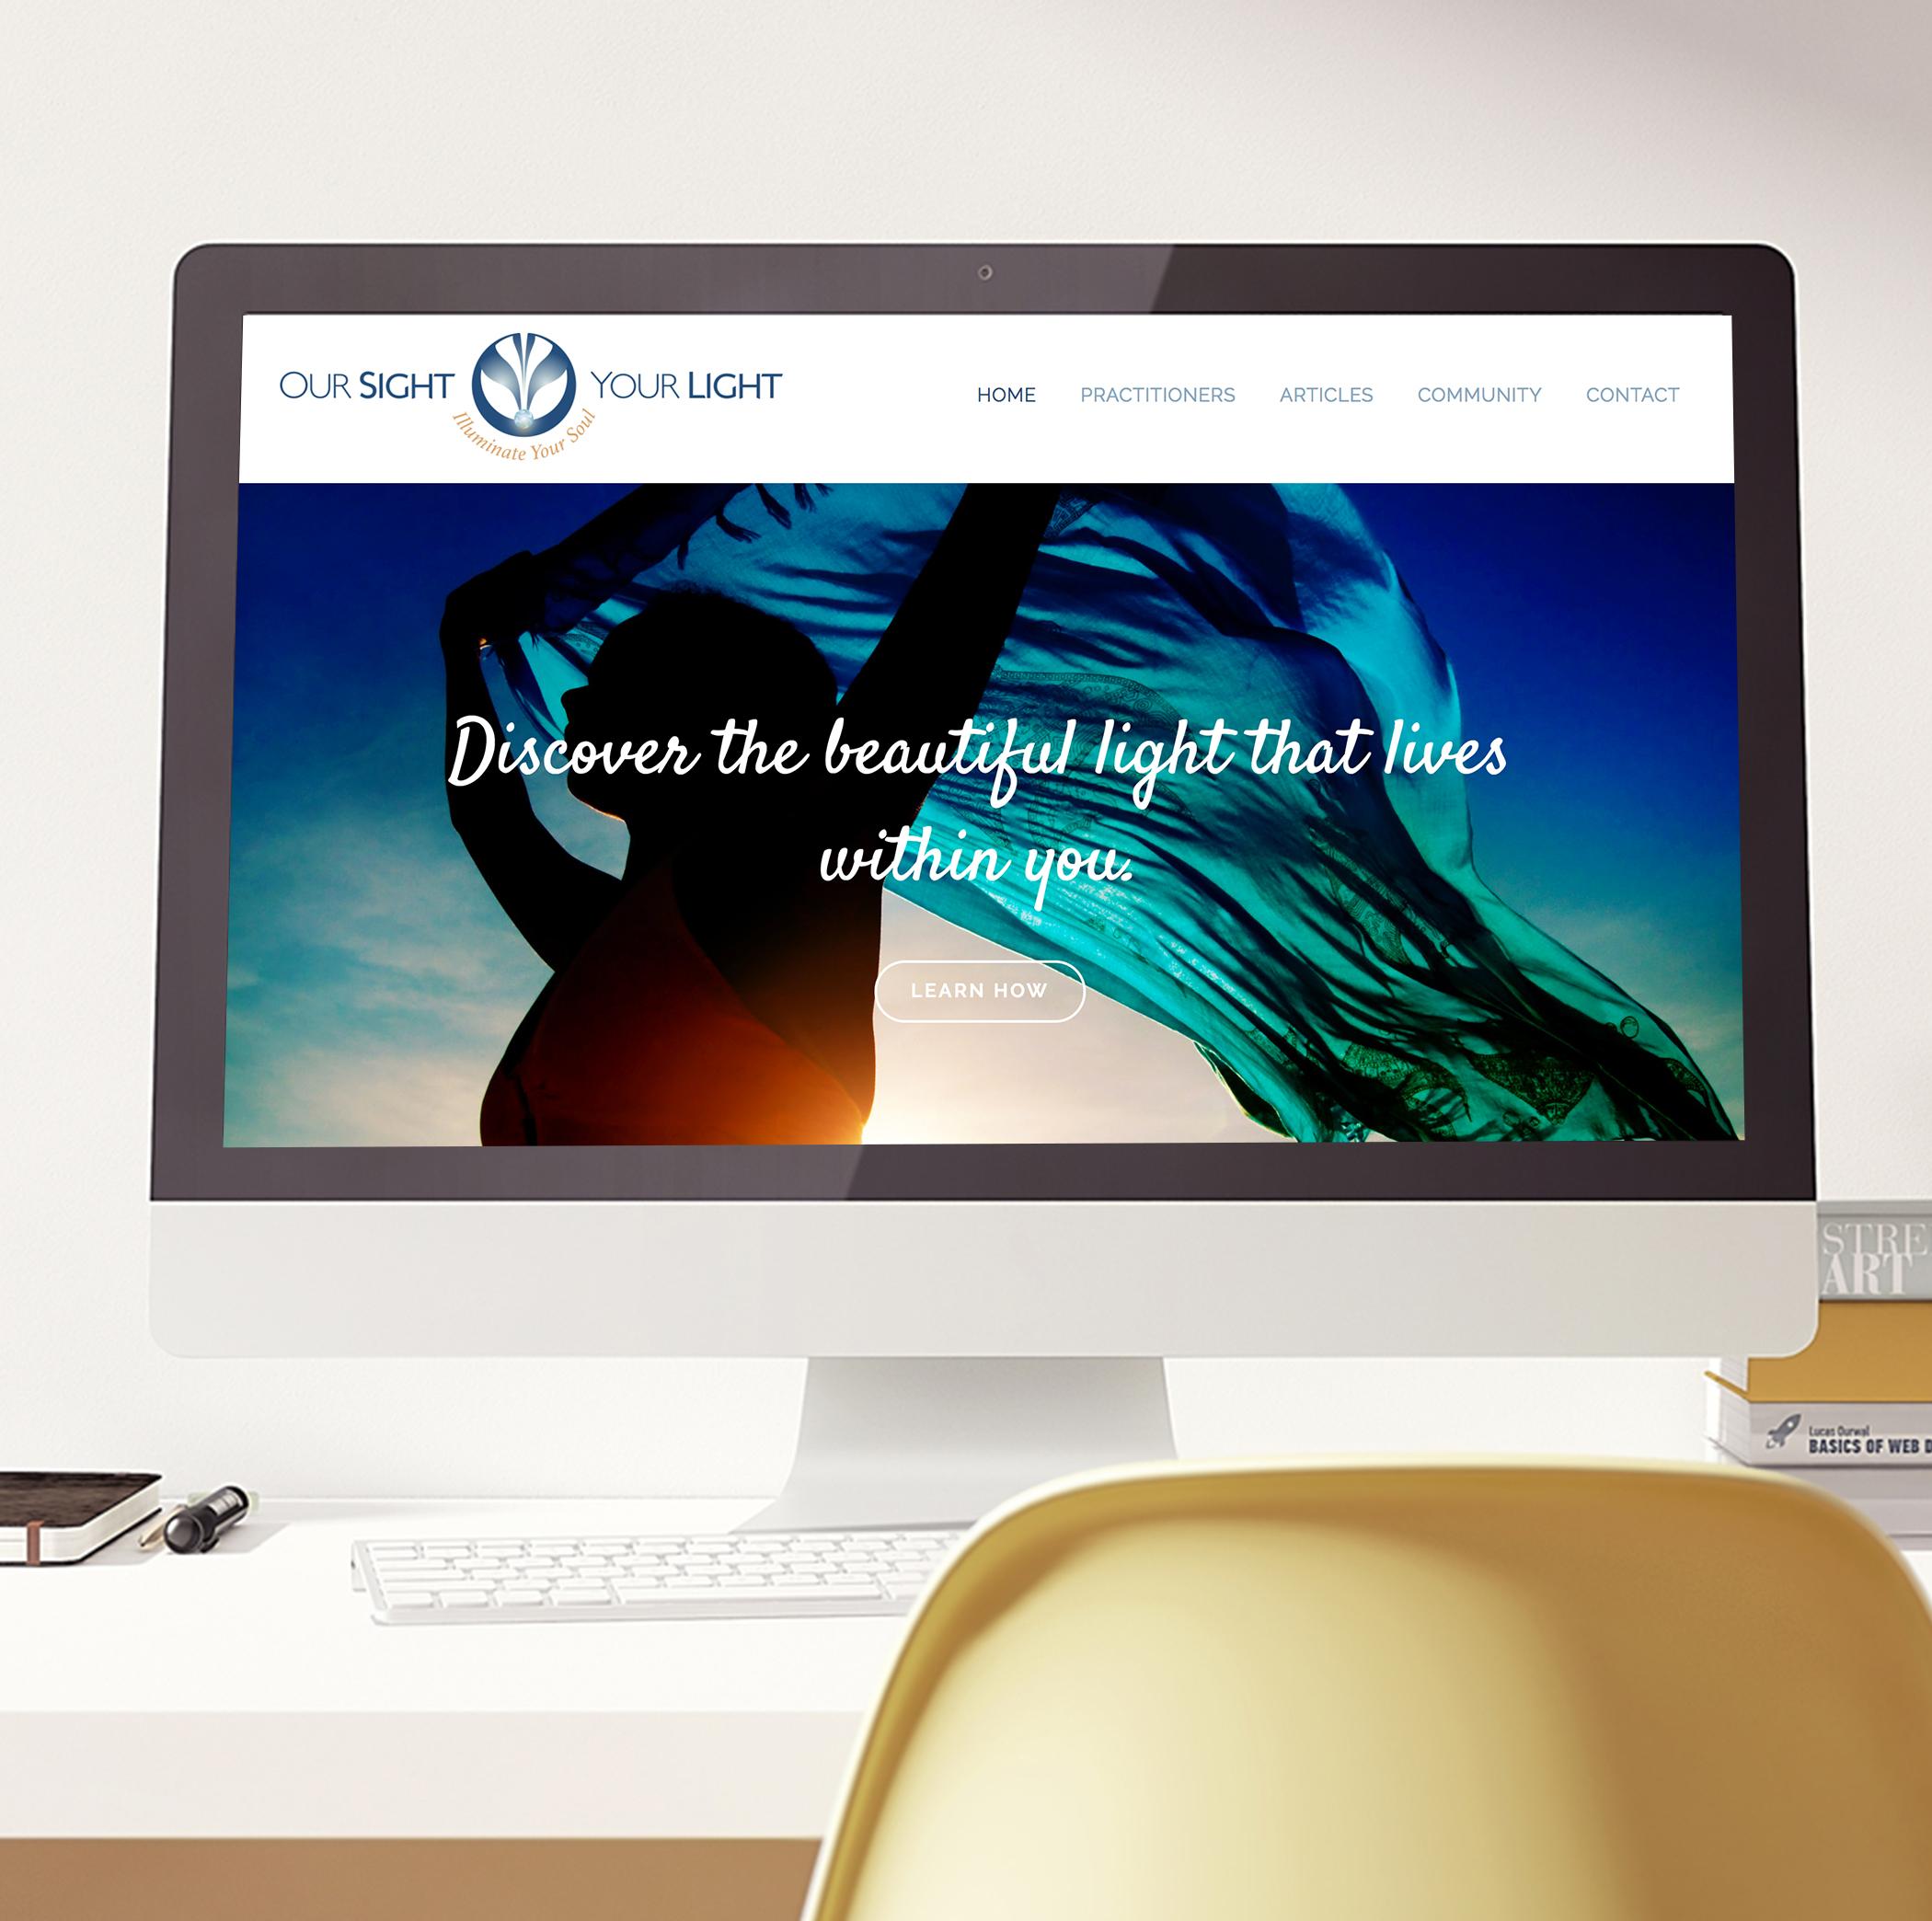 lightworker reiki healing tarot cards squarespace website design